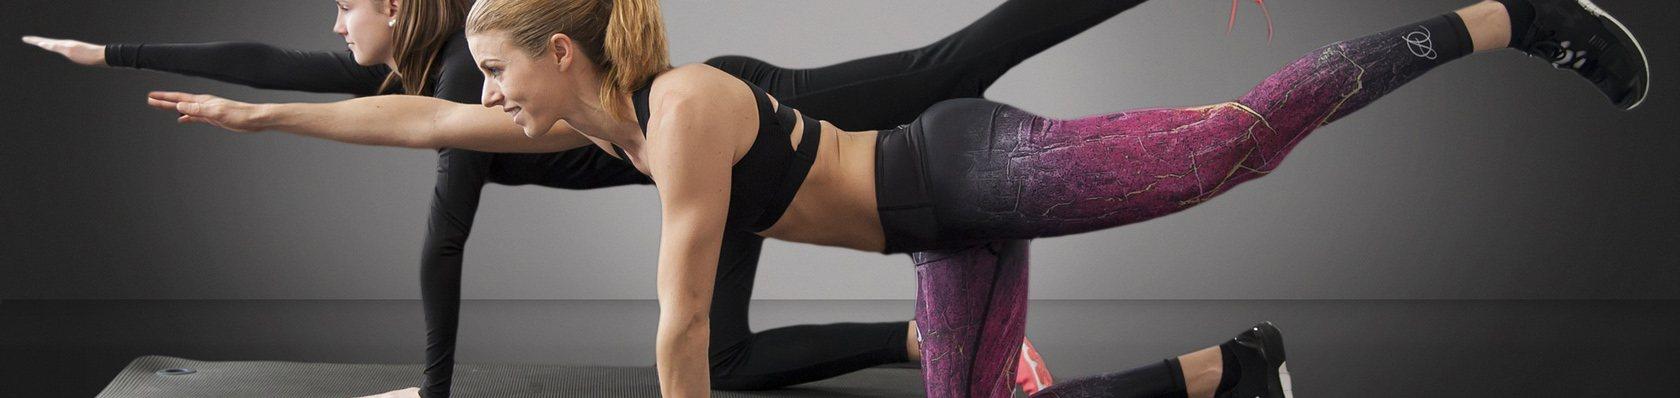 Online Fitness Studios im Test auf ExpertenTesten.de